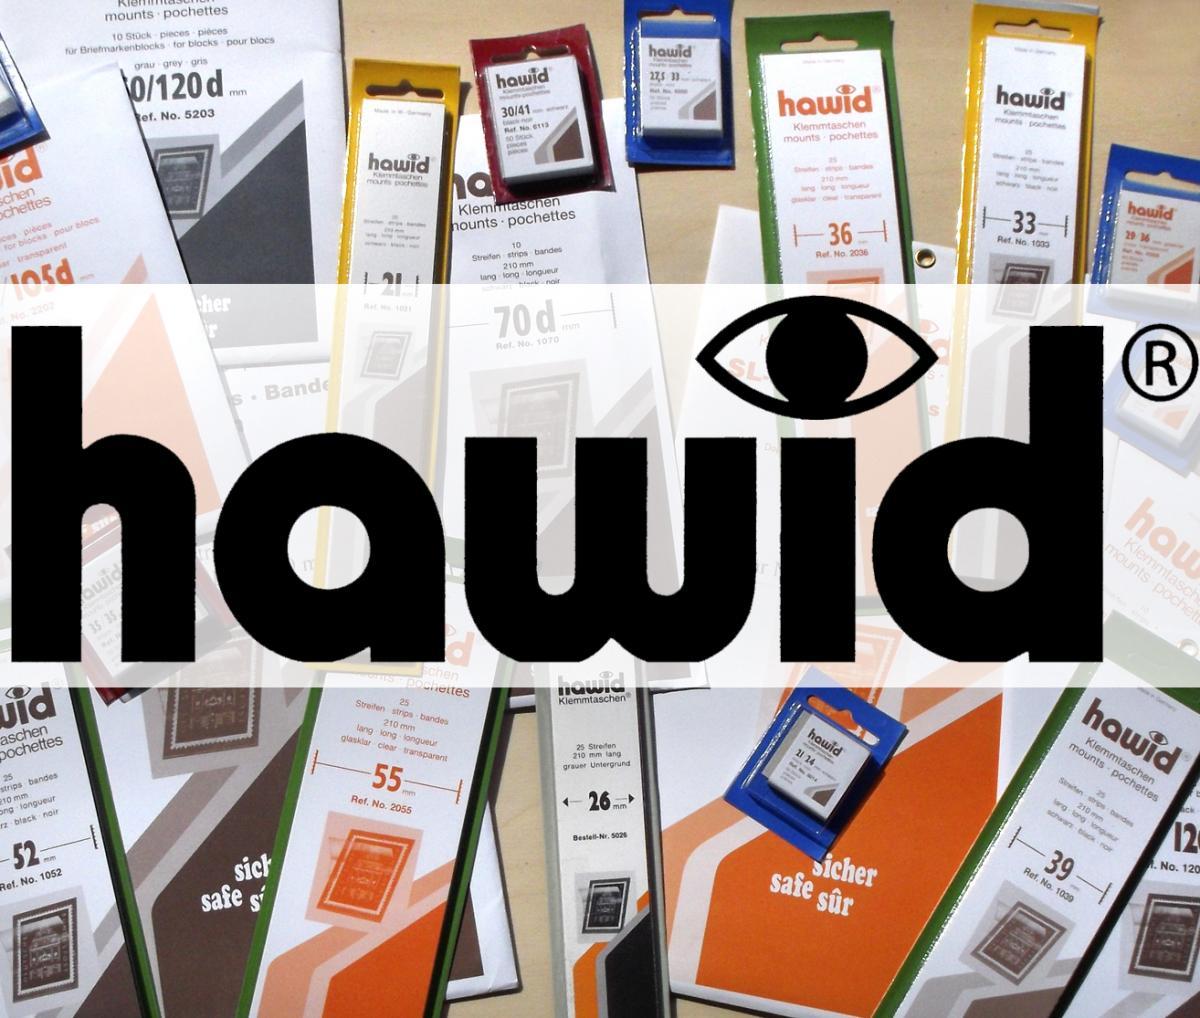 HAWID-Sonderblocks 1303, 99x74 mm, schwarz, 10 Stück 0